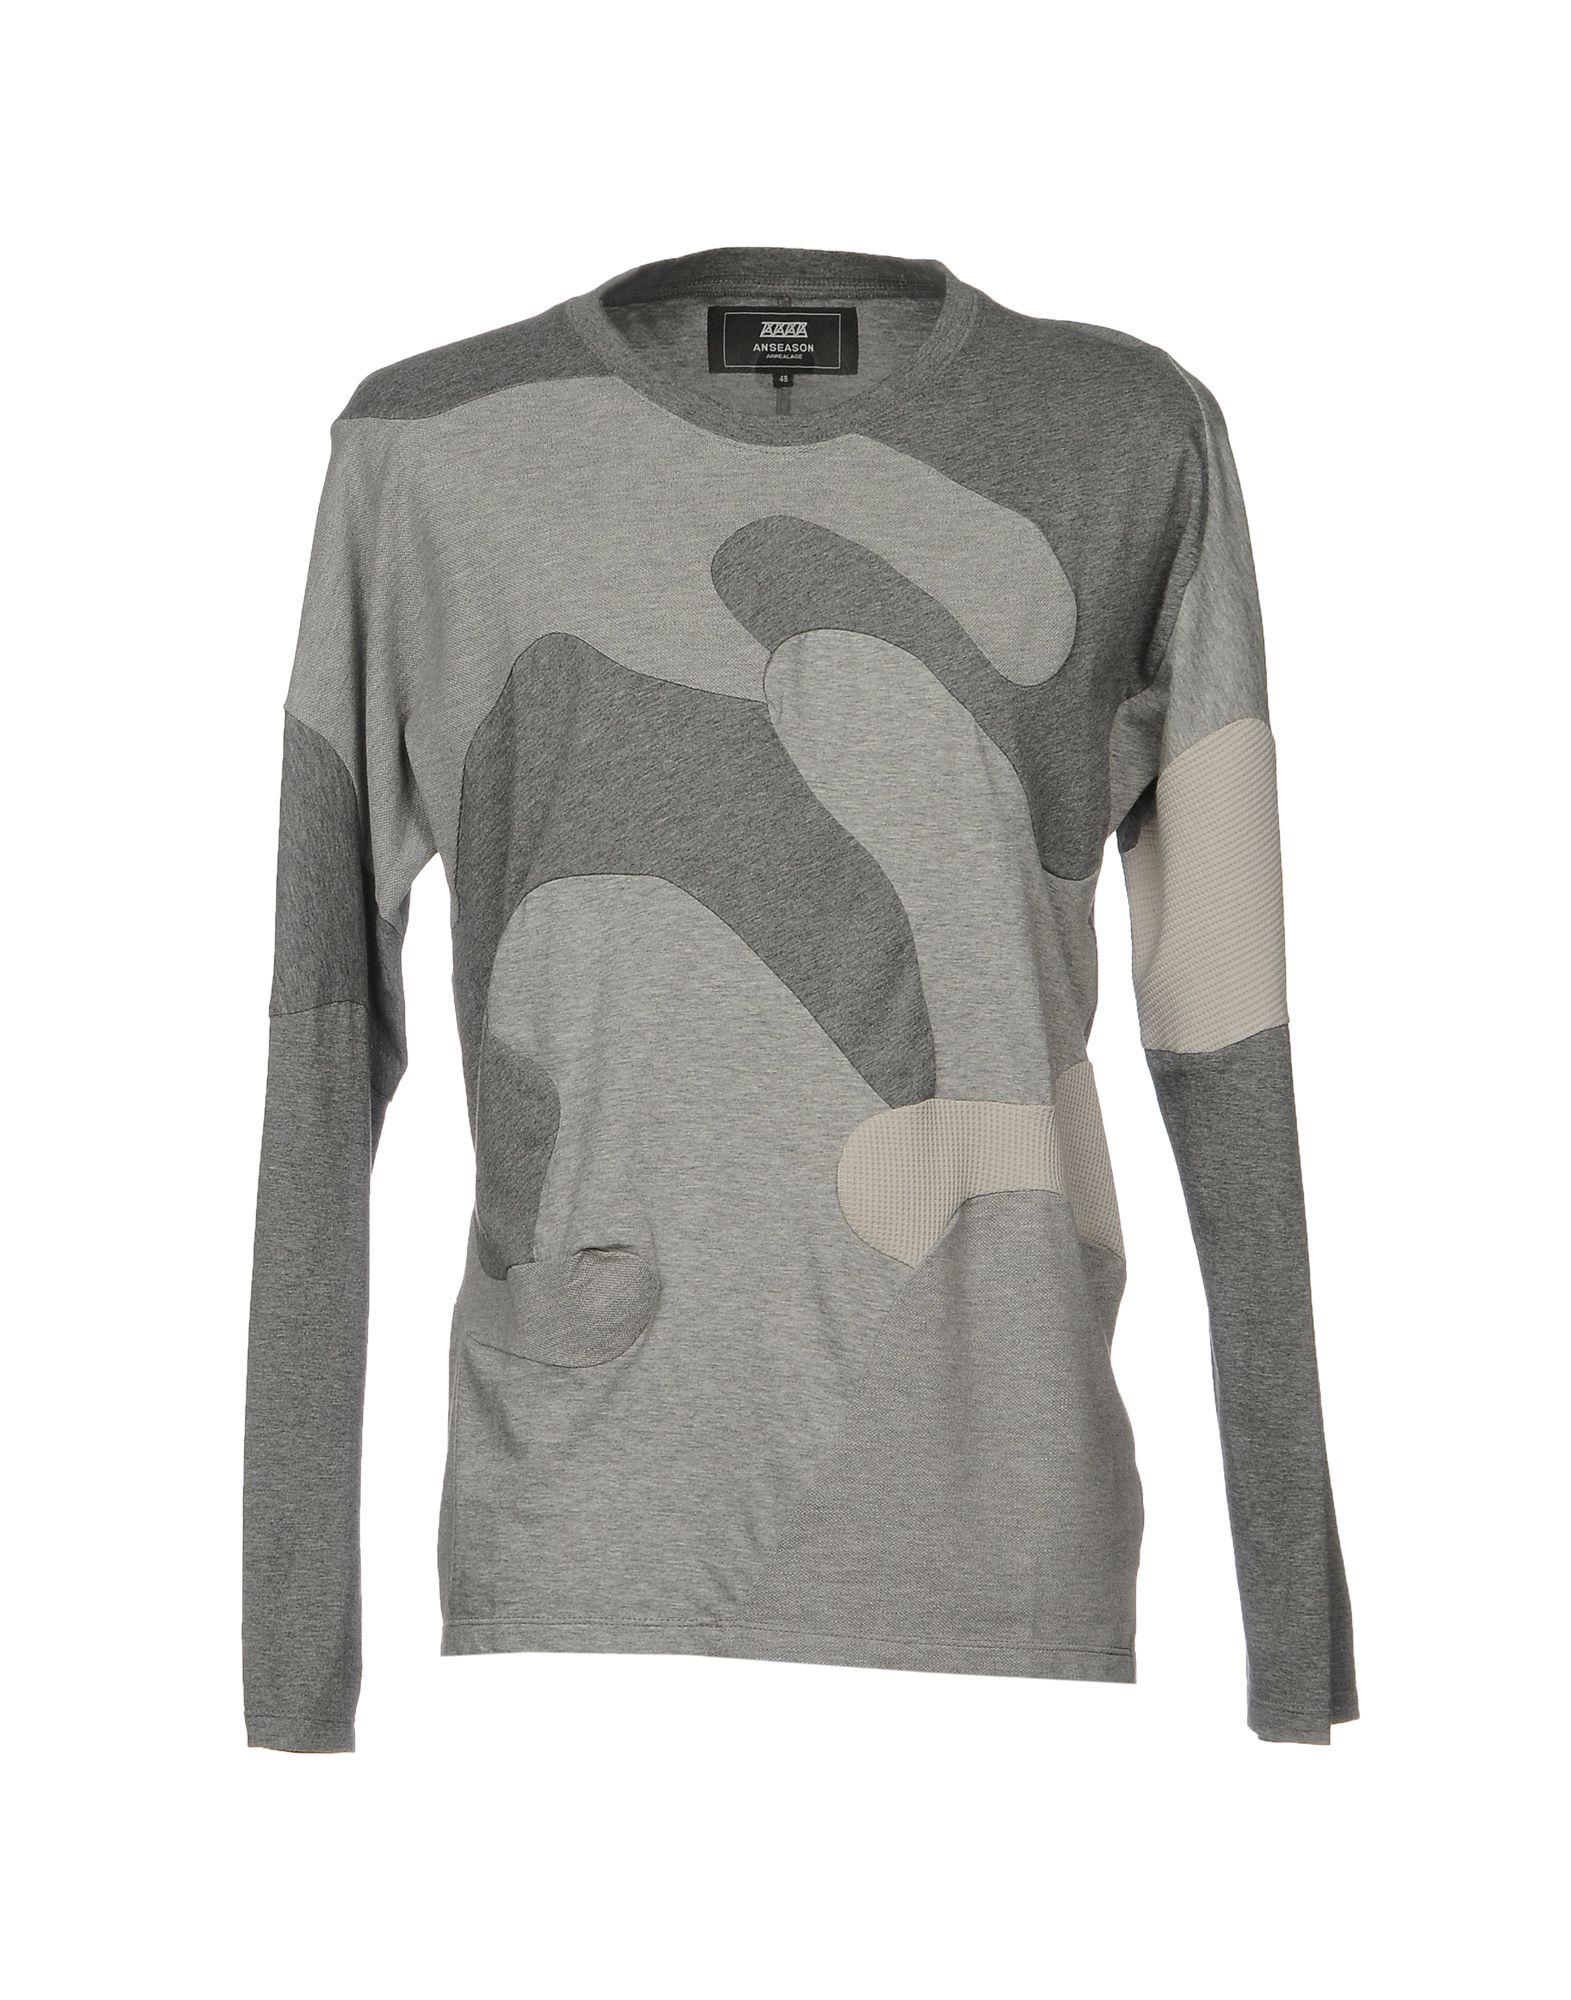 T-Shirt Anrealage Uomo - Acquista online su